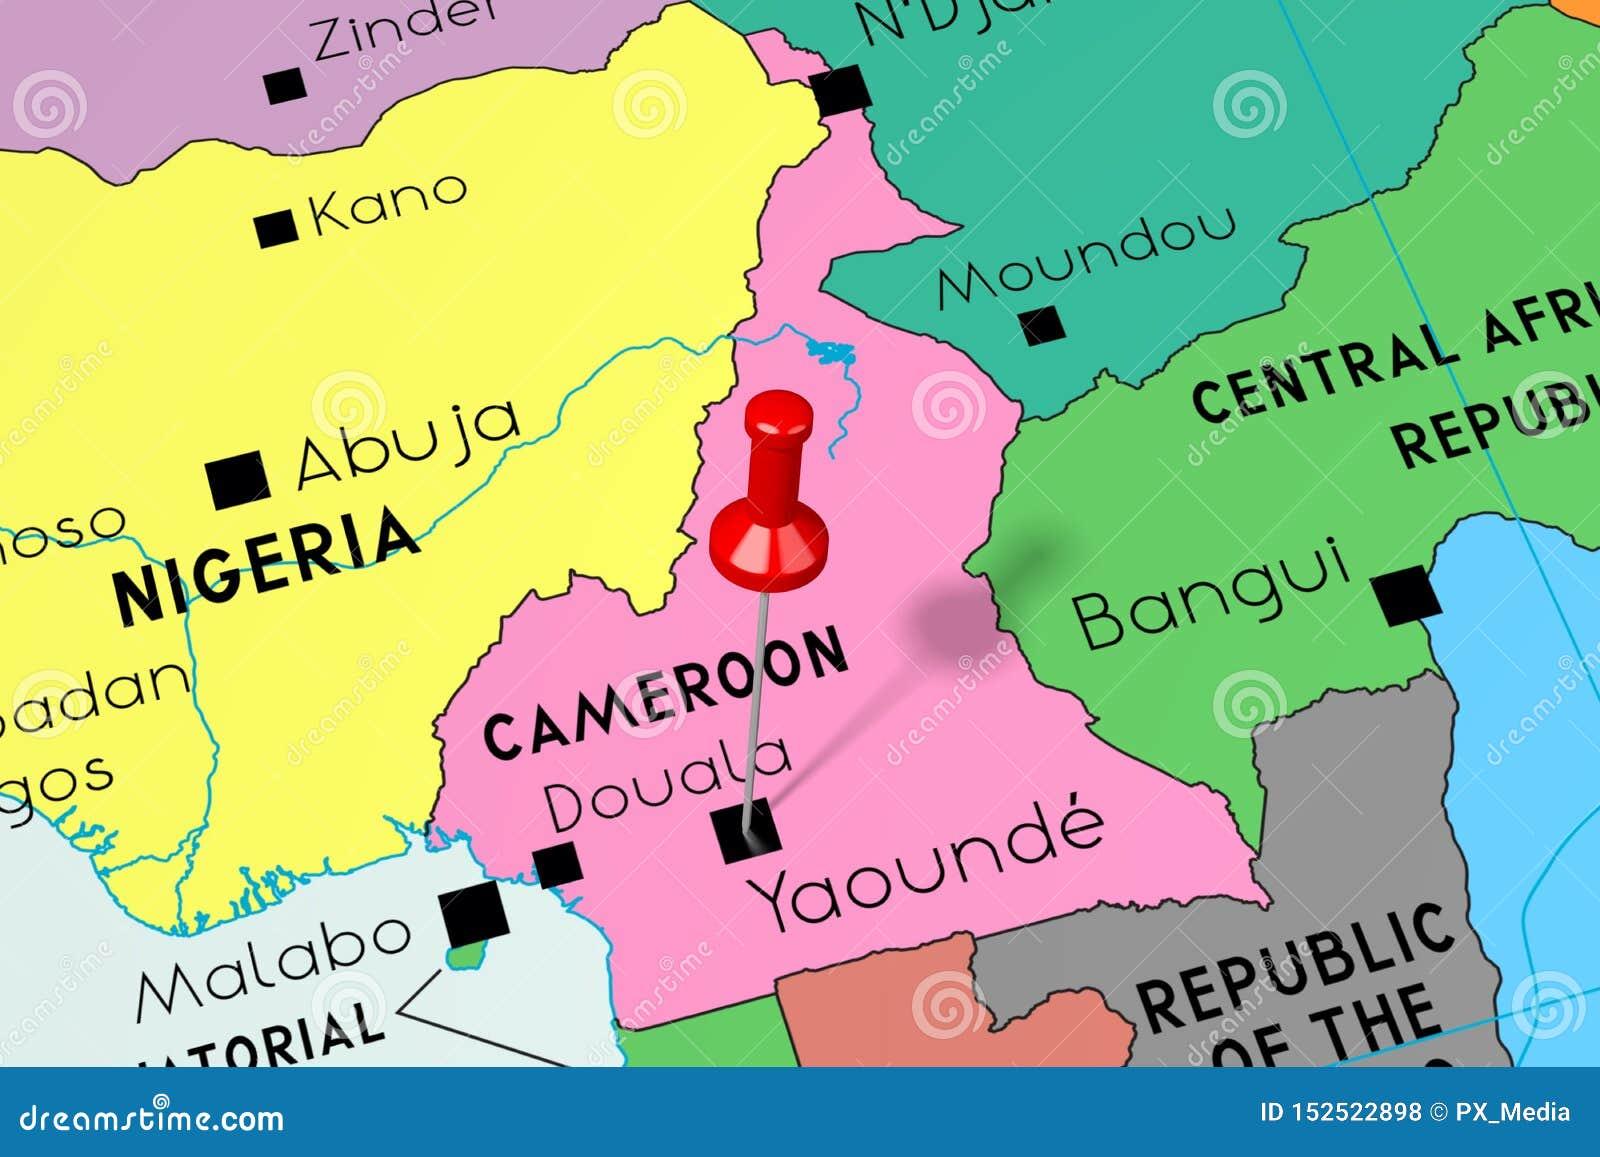 Cameroon, Yaounde - Capital City, Pinned On Political Map ... on côte d'ivoire map, estonia map, grenada map, monaco map, gambia map, saudi arabia map, rwanda map, madagascar map, ghana map, egypt map, mali map, sudan map, namibia map, croatia map, tunisia map, congo map, algeria map, thailand map, kenya map, angola map, liberia map, cape verde map, morocco map, gabon map, uganda map, africa map, libya map, nigeria map, senegal map, malawi map, ecuador map, comoros map, niger map, ethiopia map, mozambique map, zimbabwe map,